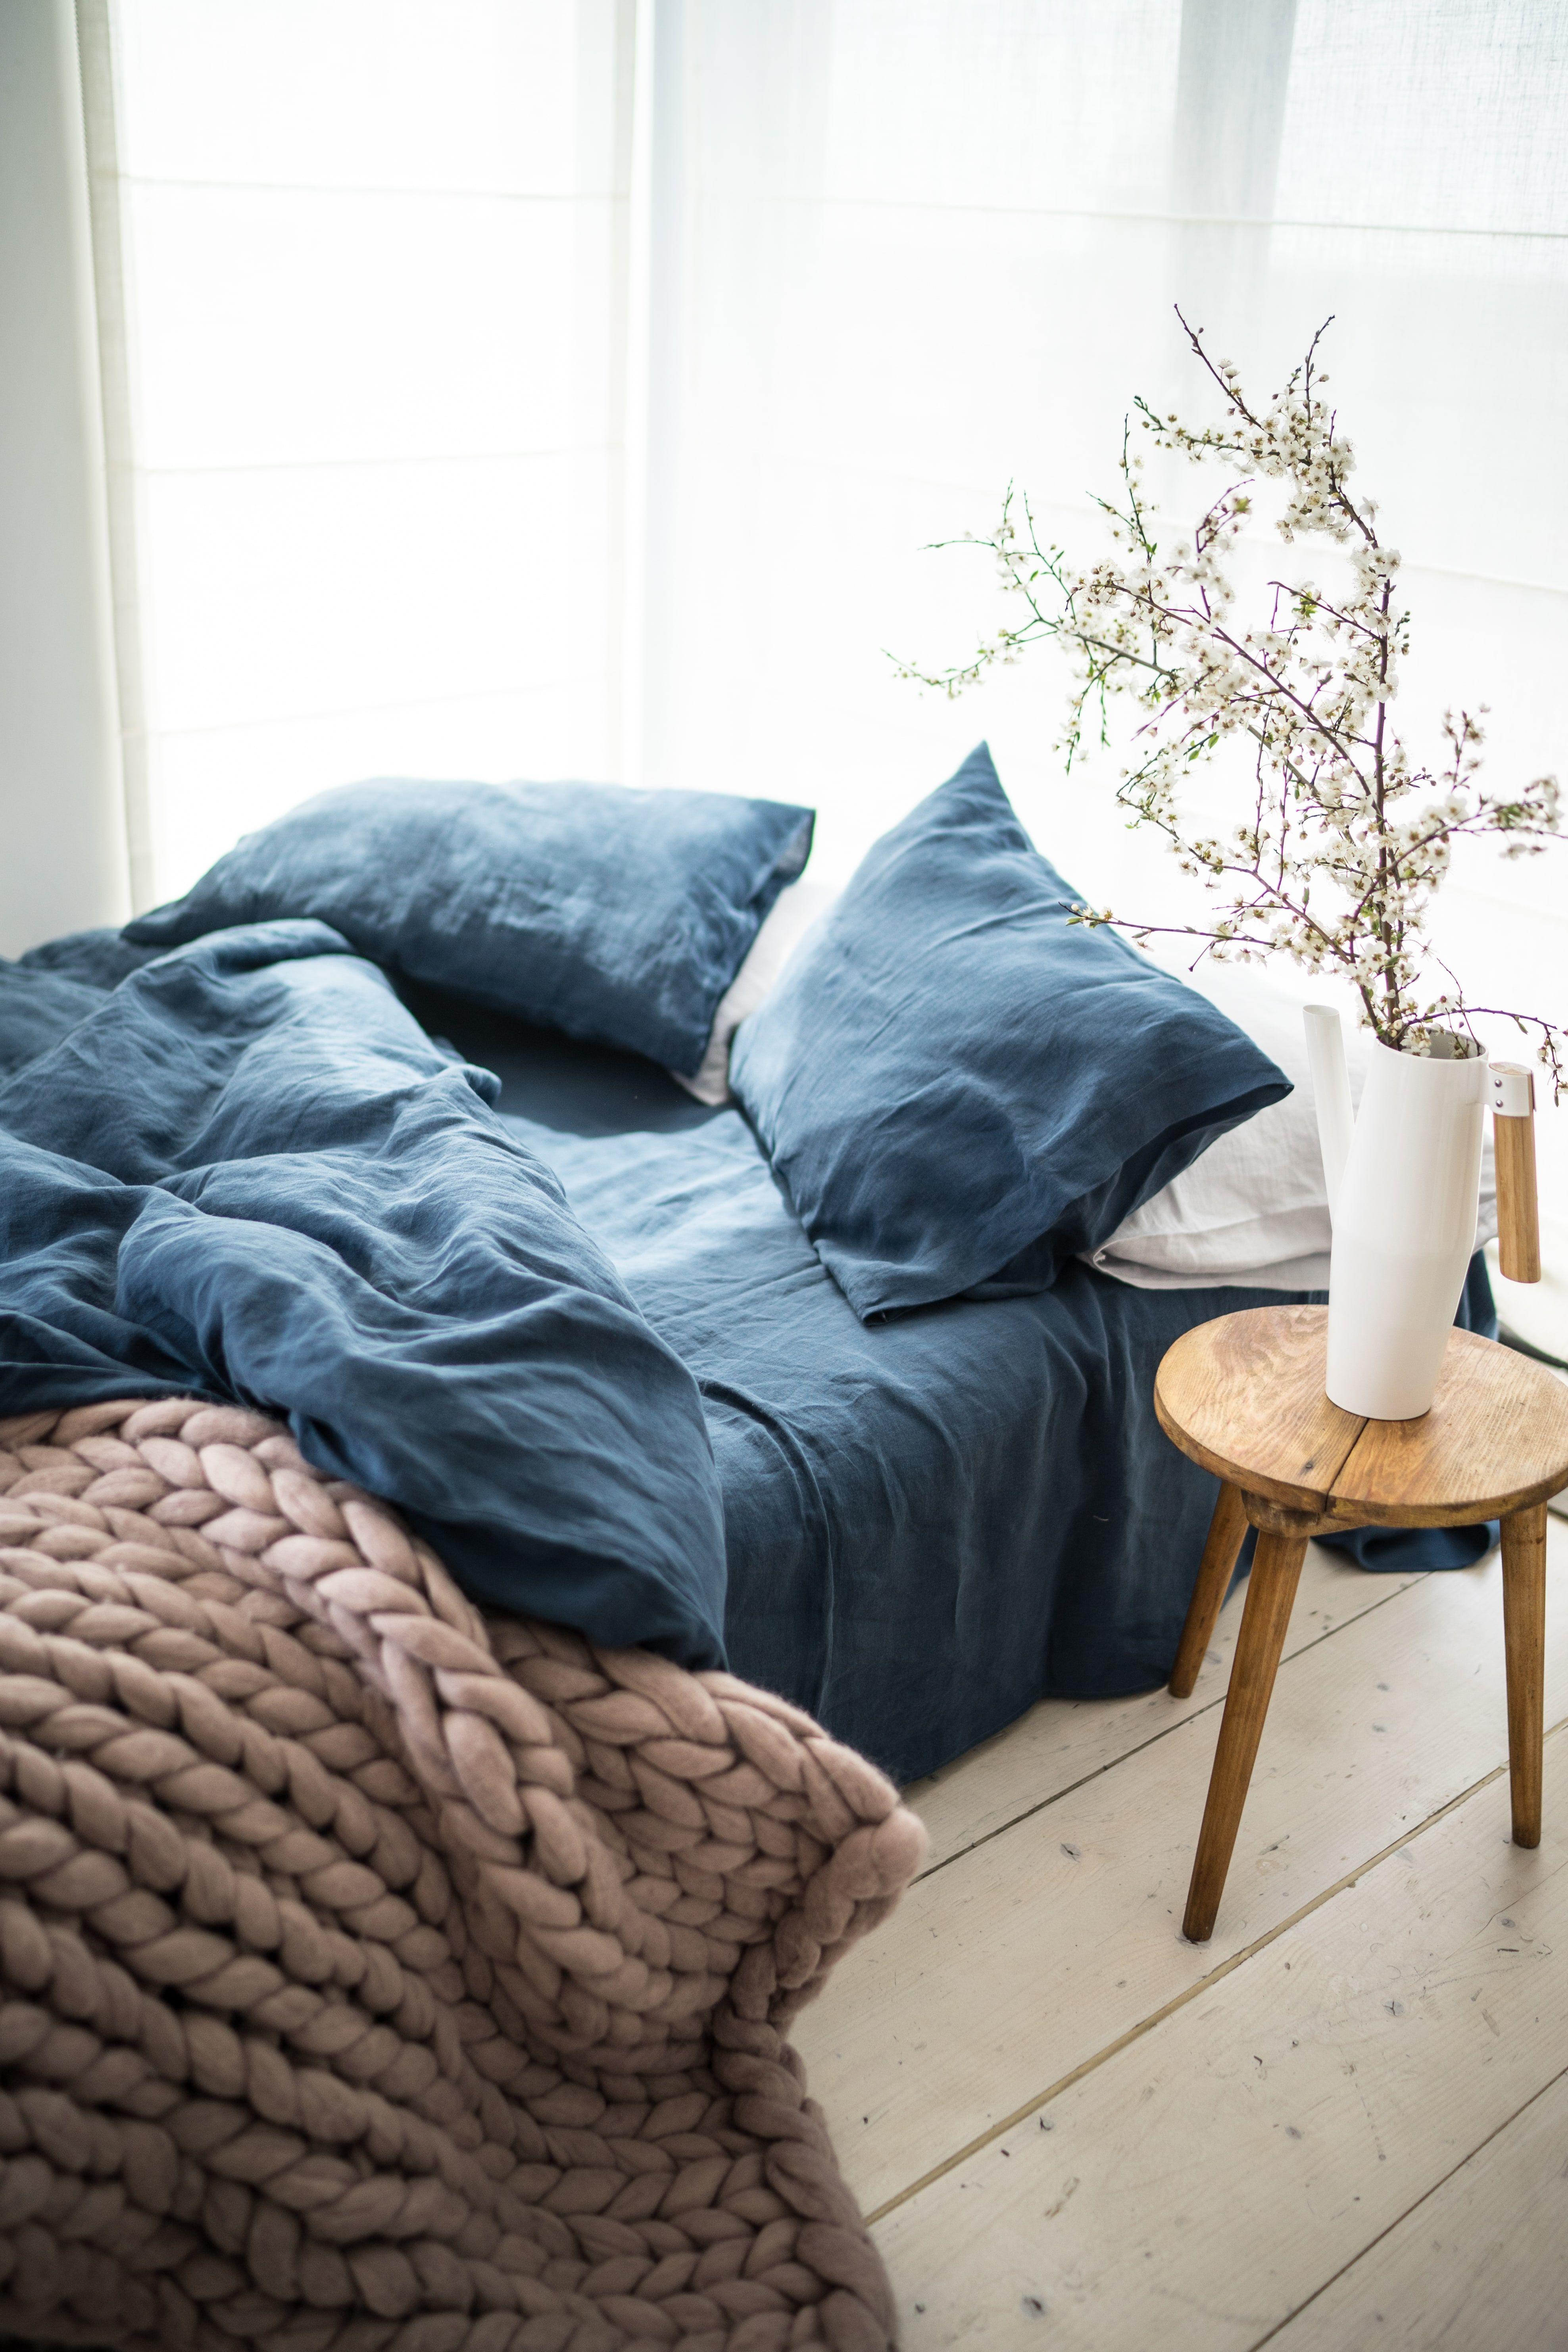 "Your Organic Bedroom: Small Throw Blanket 35""x50"" (90x130 Cm)"